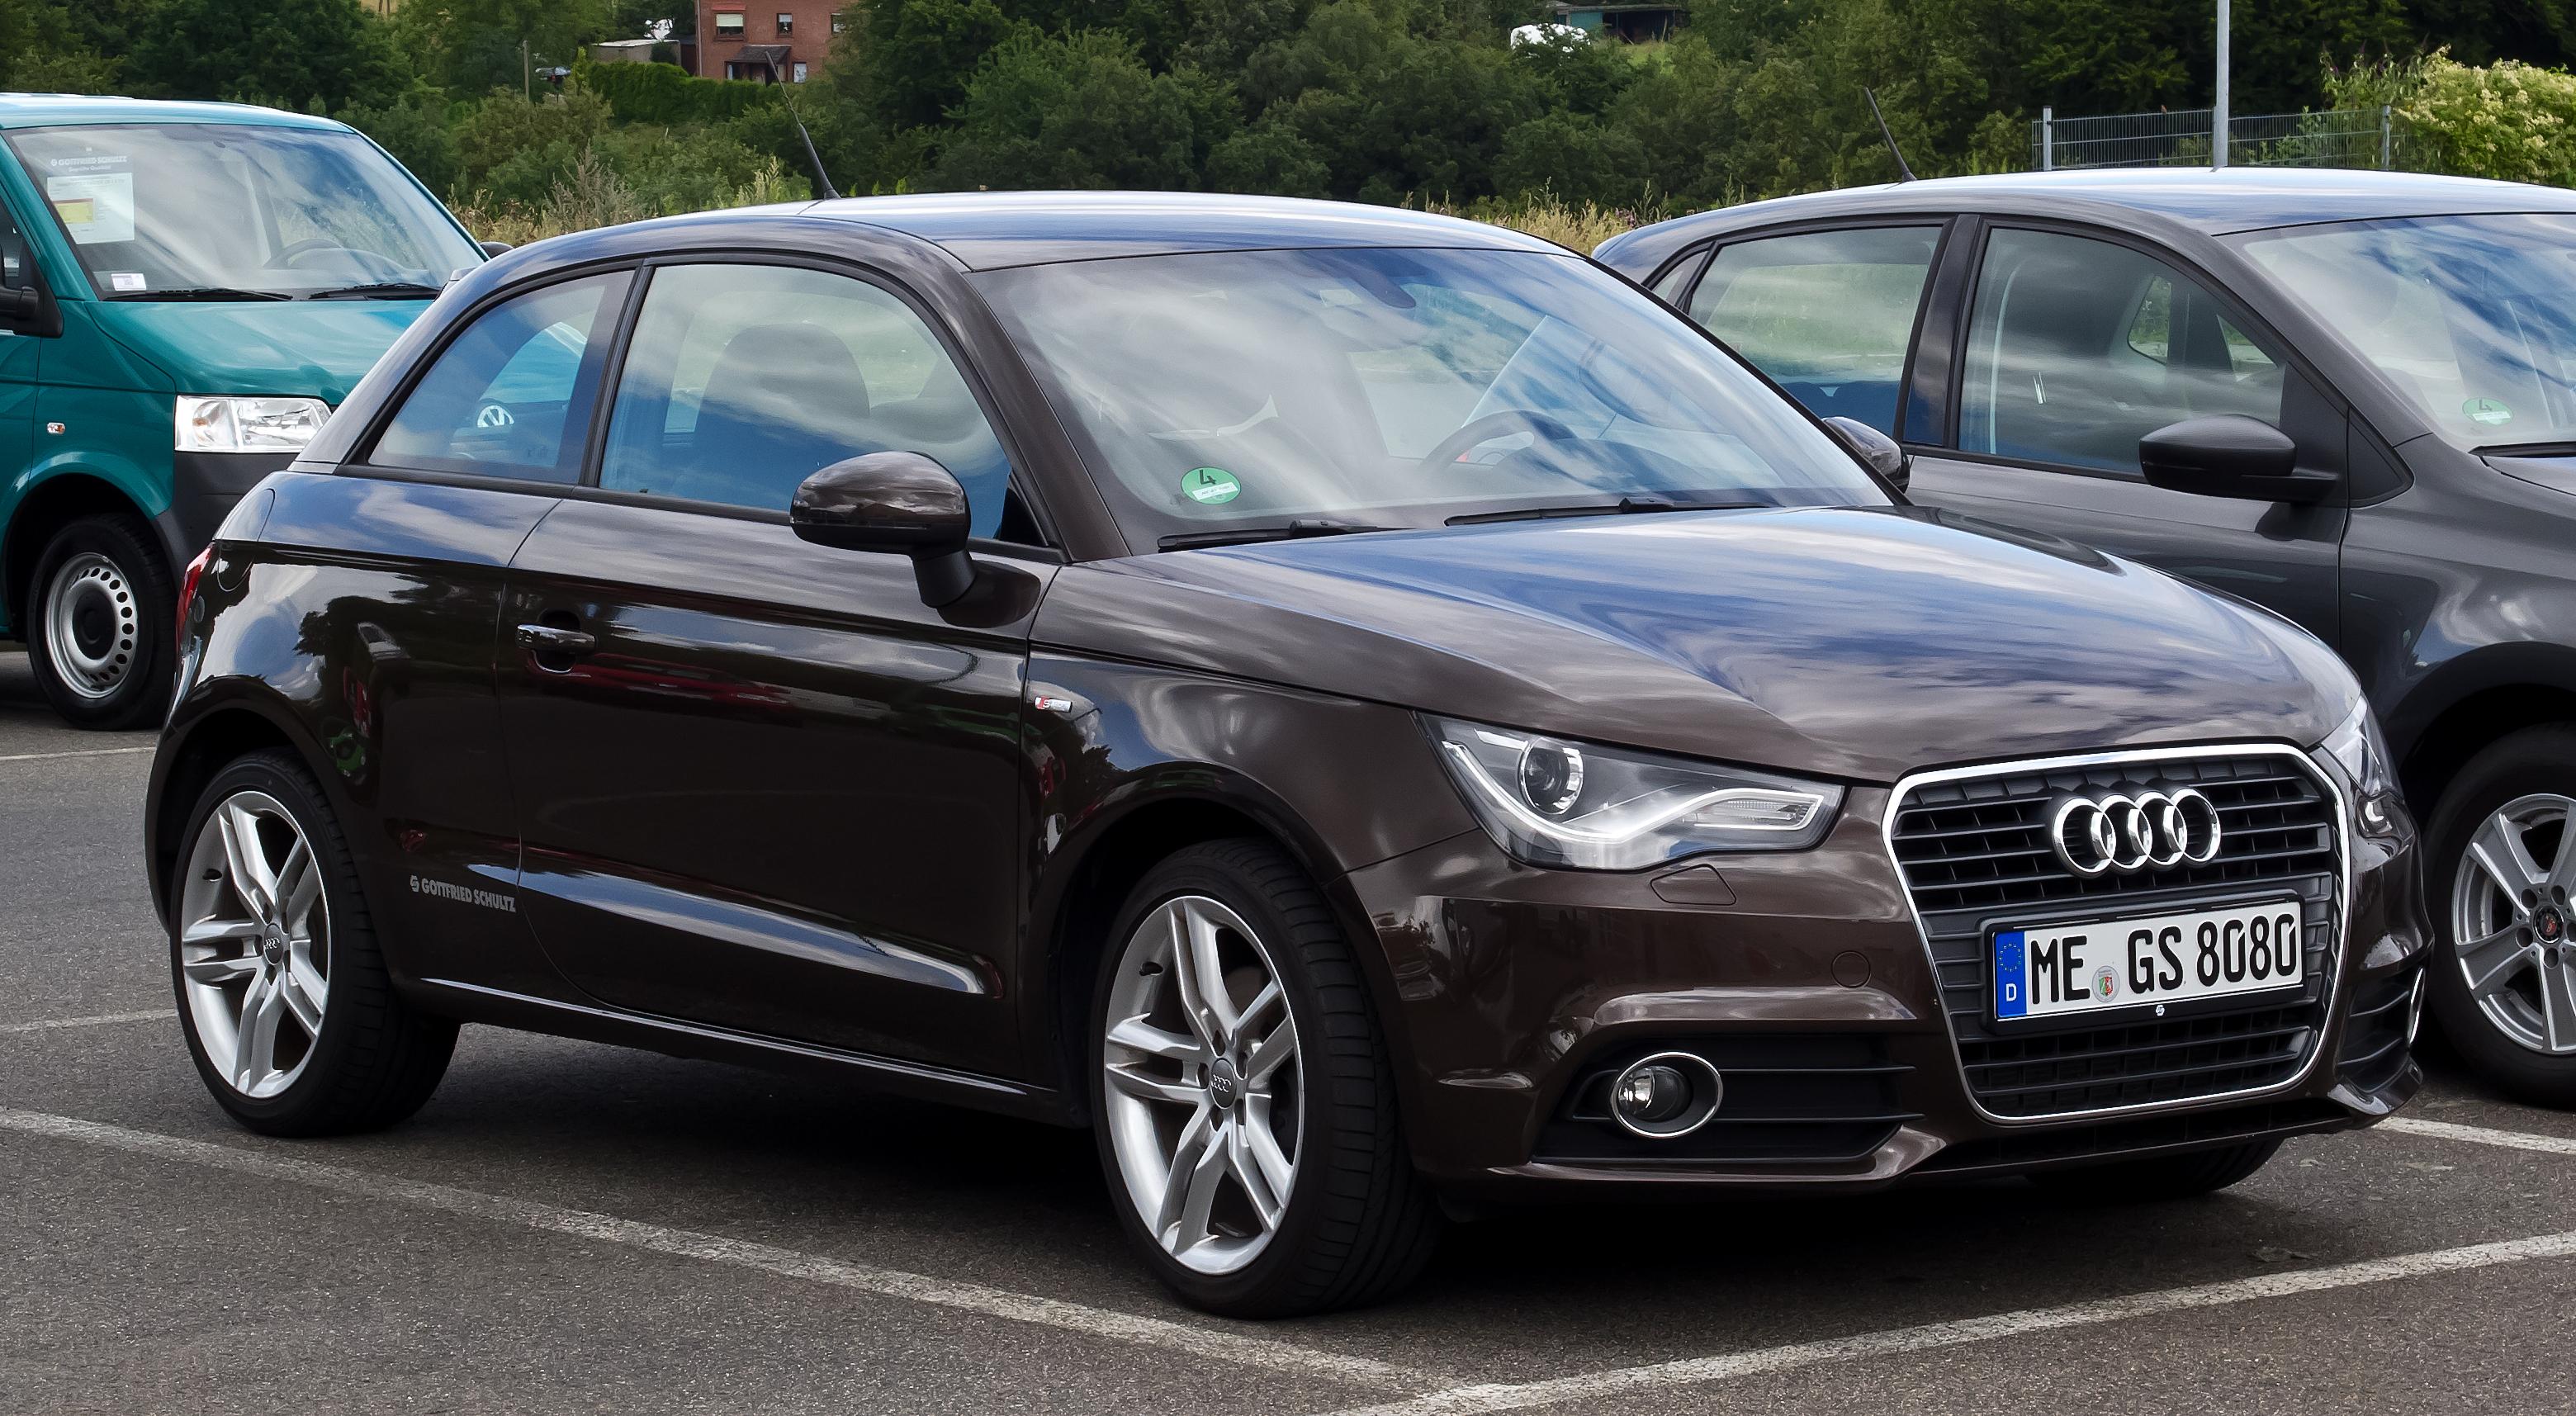 File Audi A1 1 4 Tfsi Ambition S Line Frontansicht 21